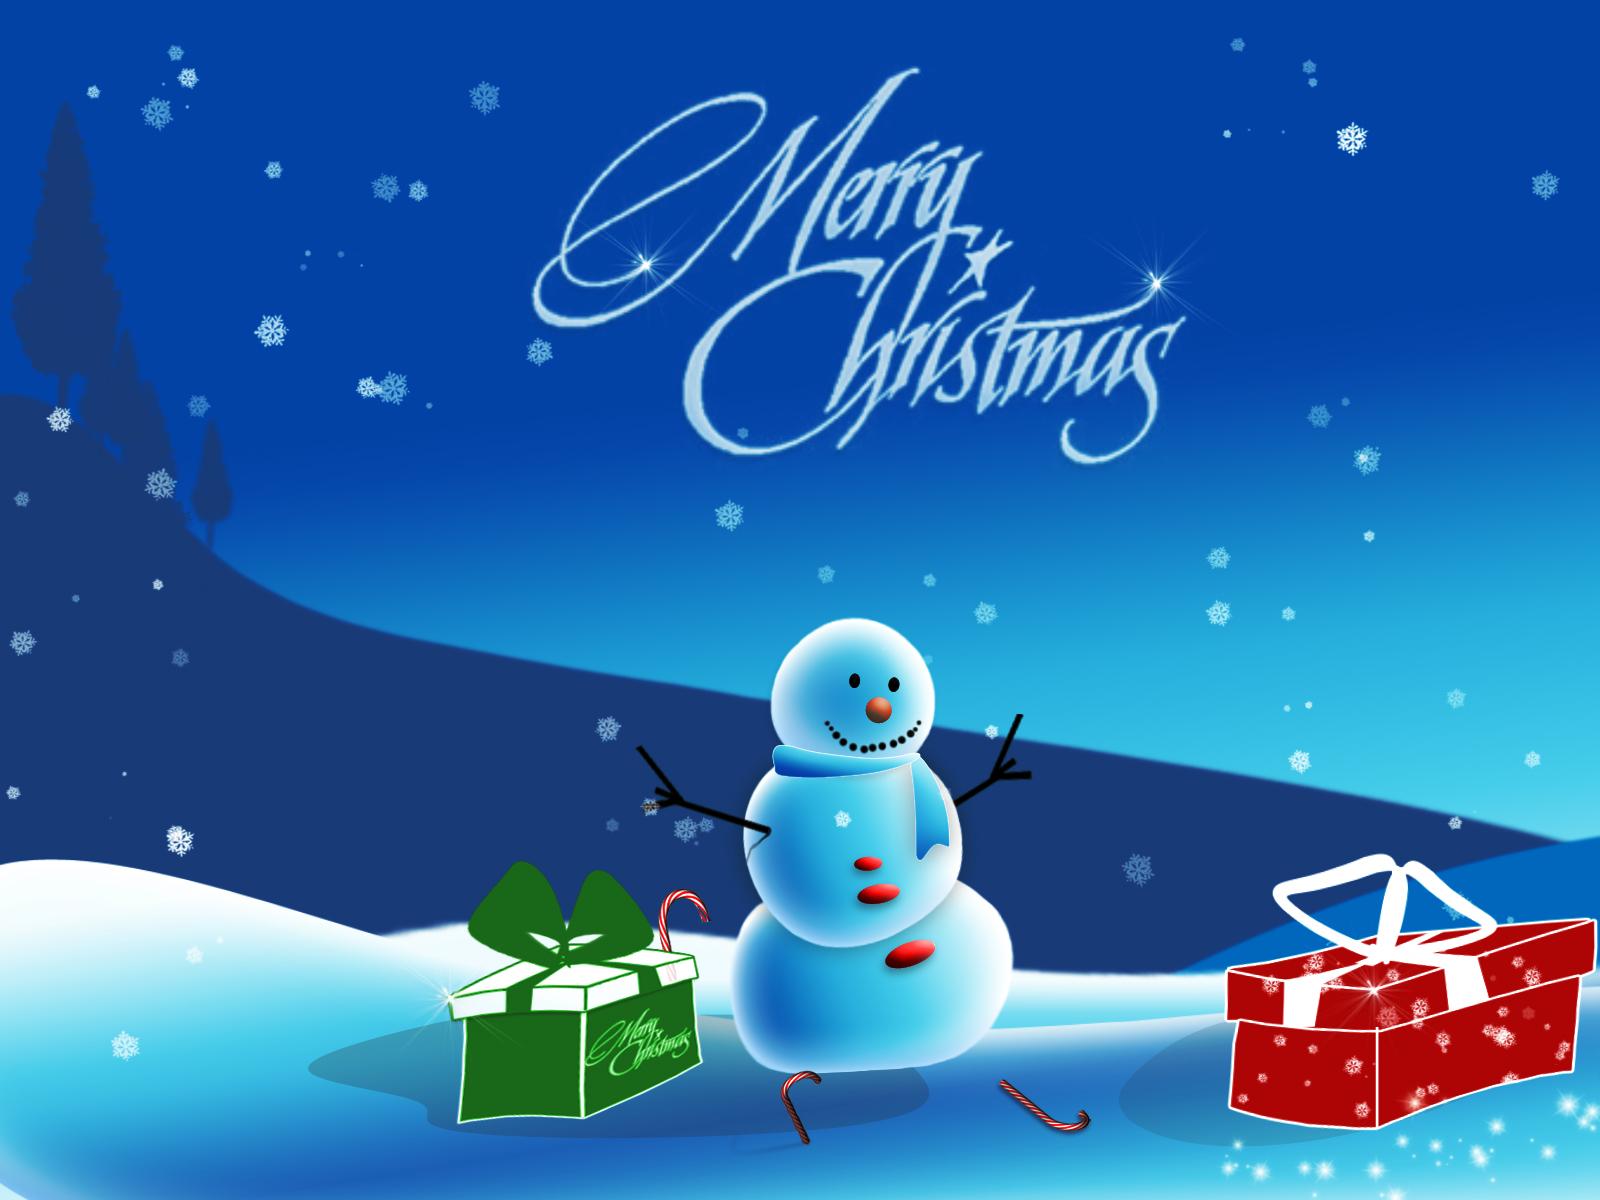 https://3.bp.blogspot.com/-XDhFDRJSvhI/TnnPo3CgSyI/AAAAAAAAAq0/h2mTHkf_3wg/s1600/wallpaper-gifts_for_snowman.jpg